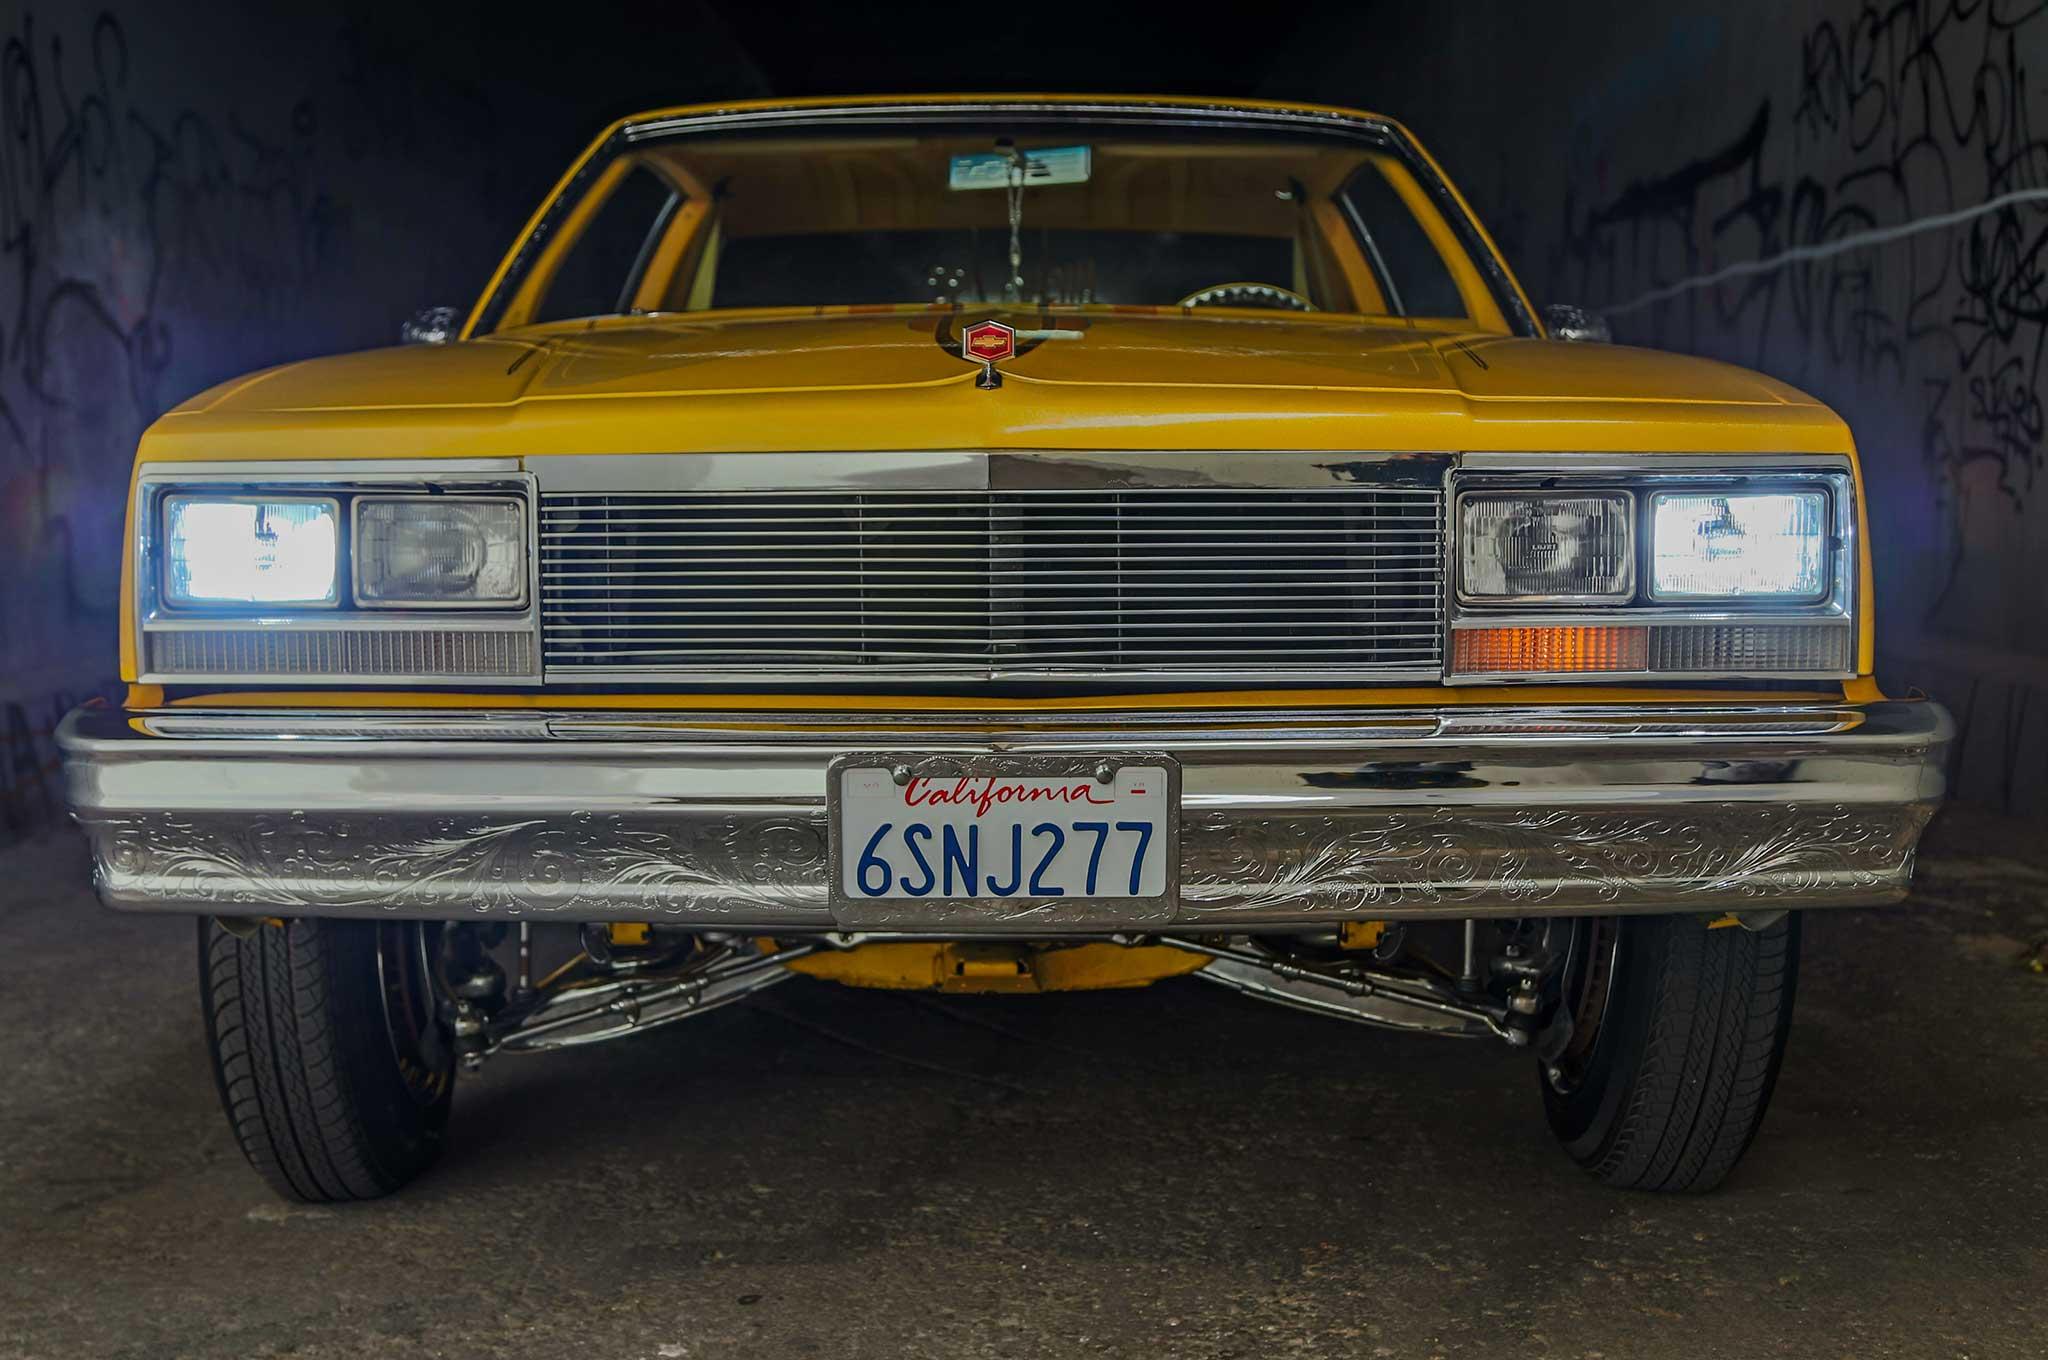 1979 Chevrolet Malibu - Ladies First - Lowrider